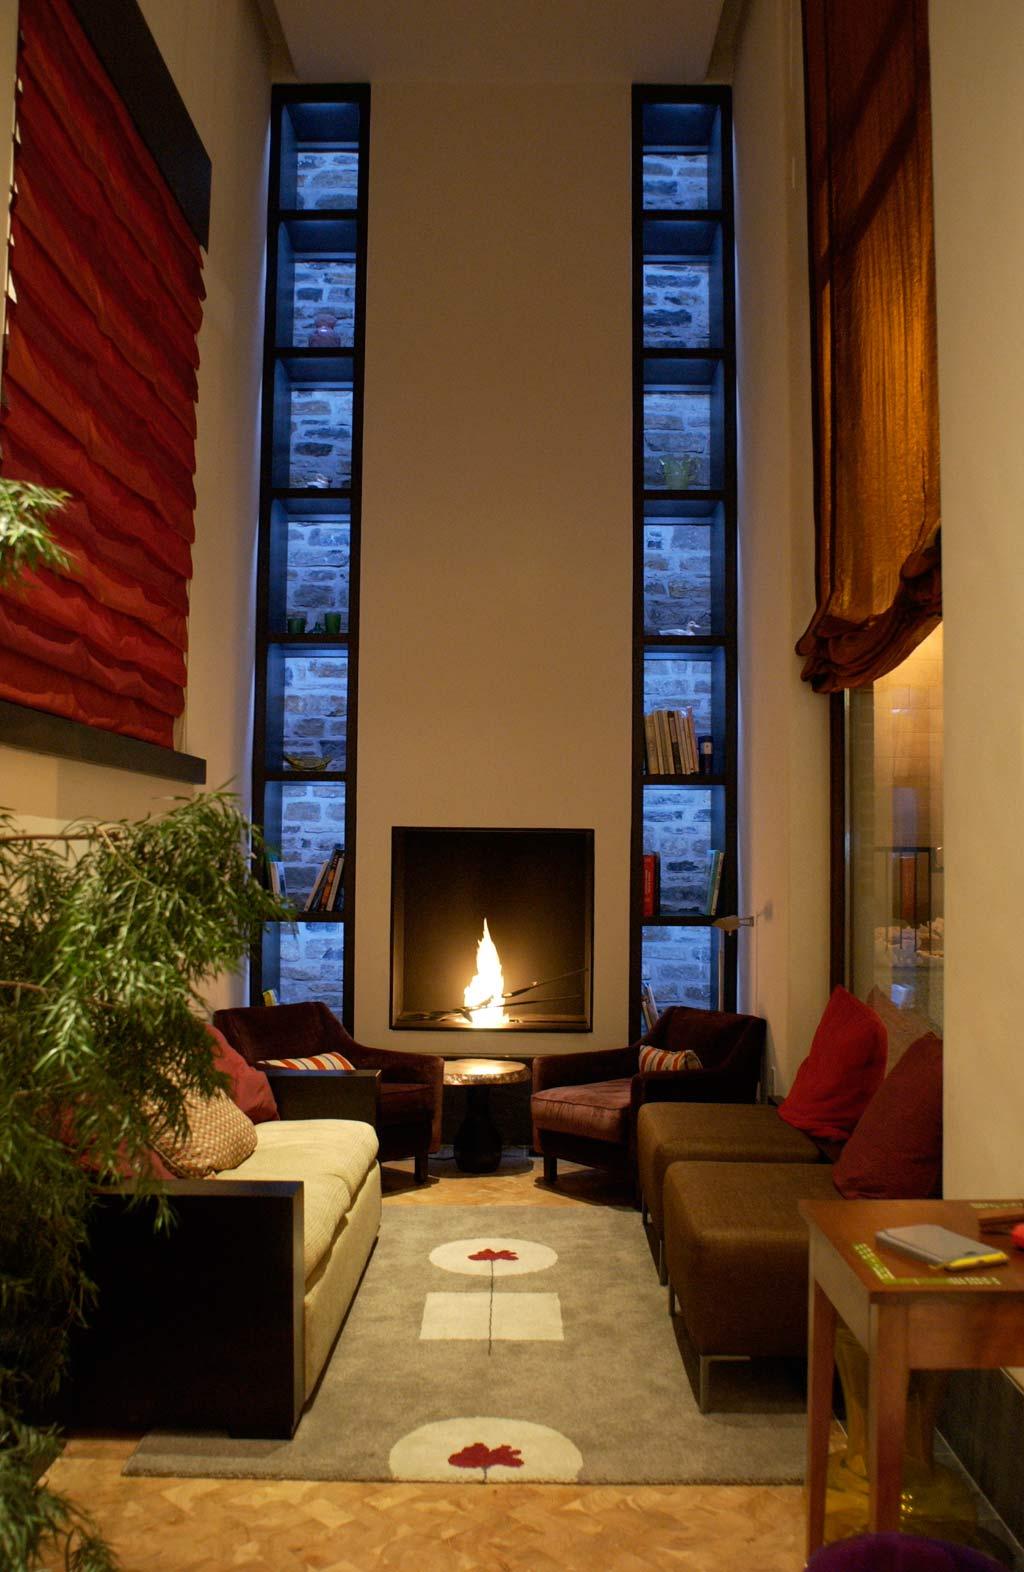 Lounge of Auberge Saint-Antoine, Quebec City, PQ, Canada